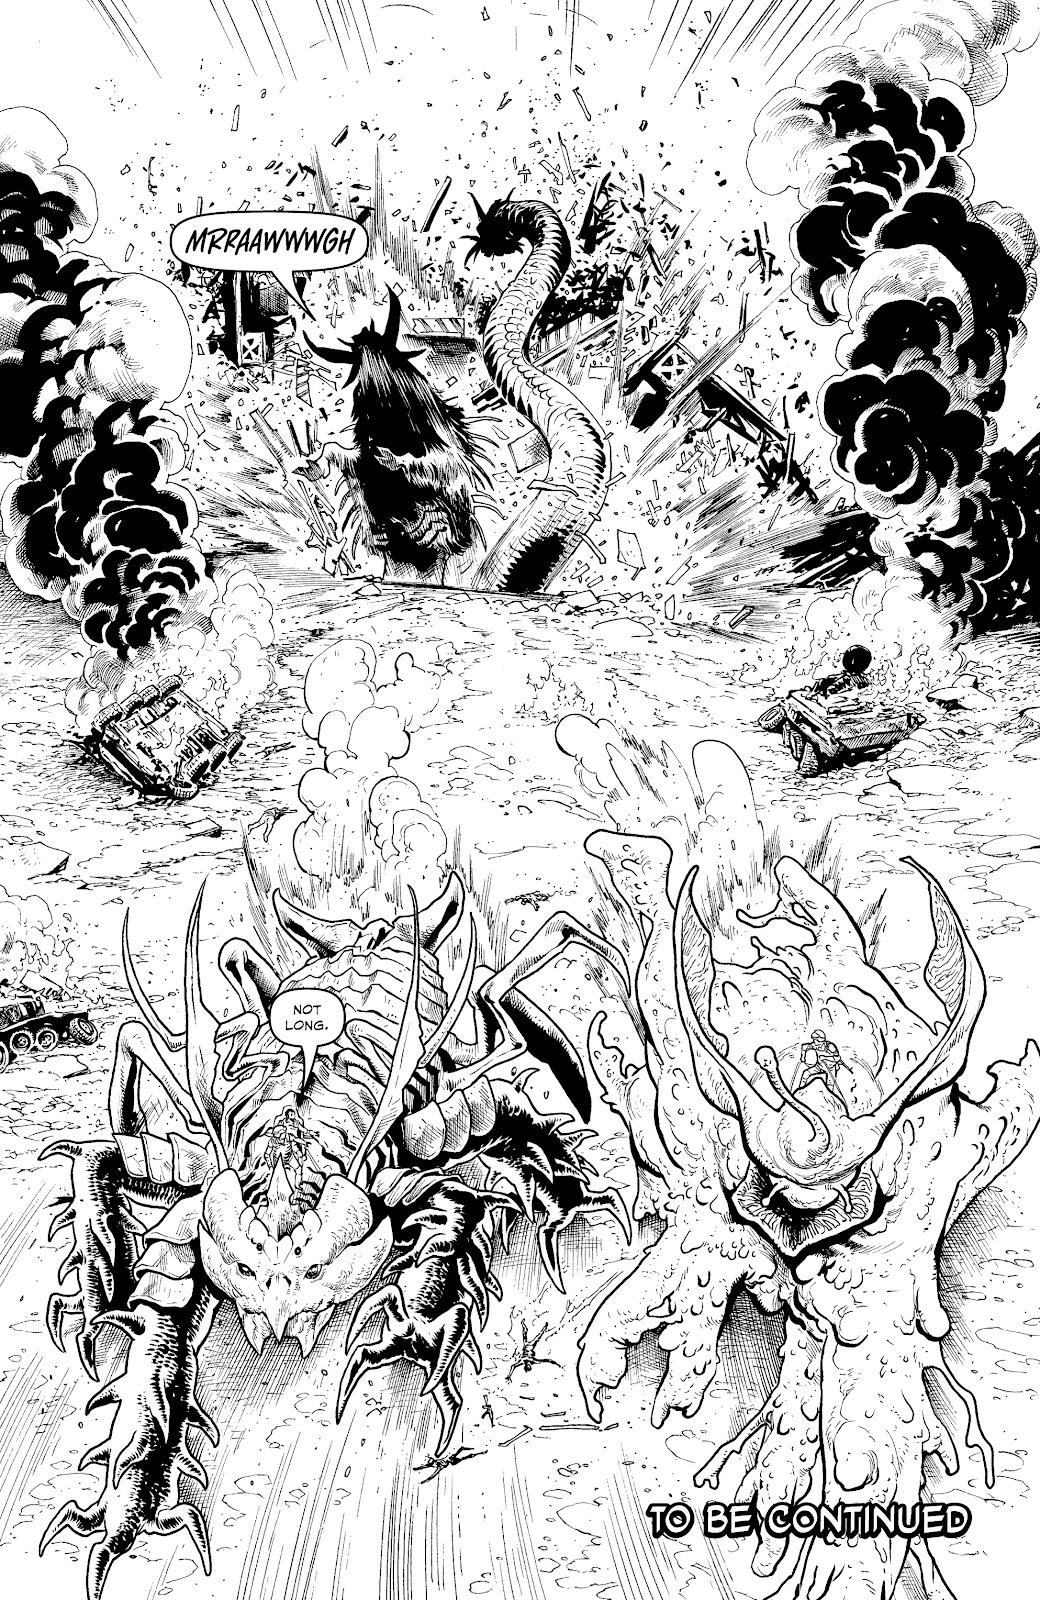 Read online Alan Moore's Cinema Purgatorio comic -  Issue #17 - 49